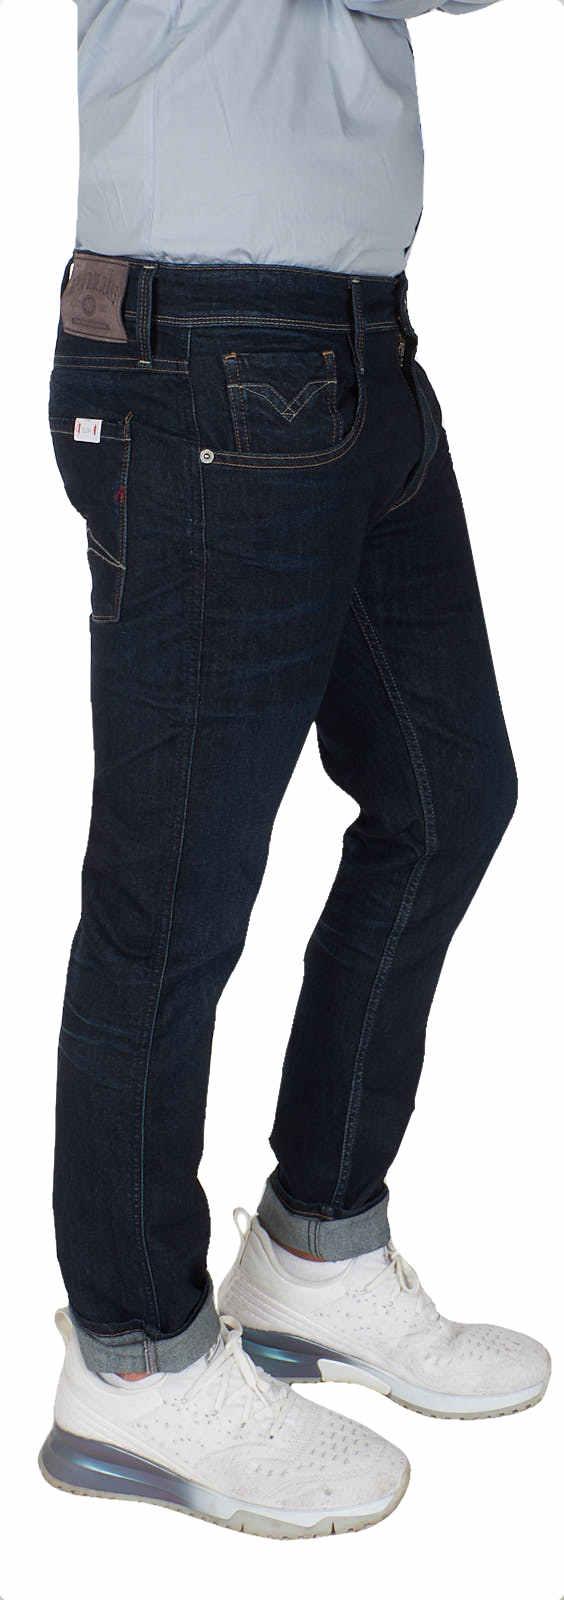 REPLAY Jeans Herrren Anbass Slim Fit Pantalon Stretch Denim m914y.000.573.320